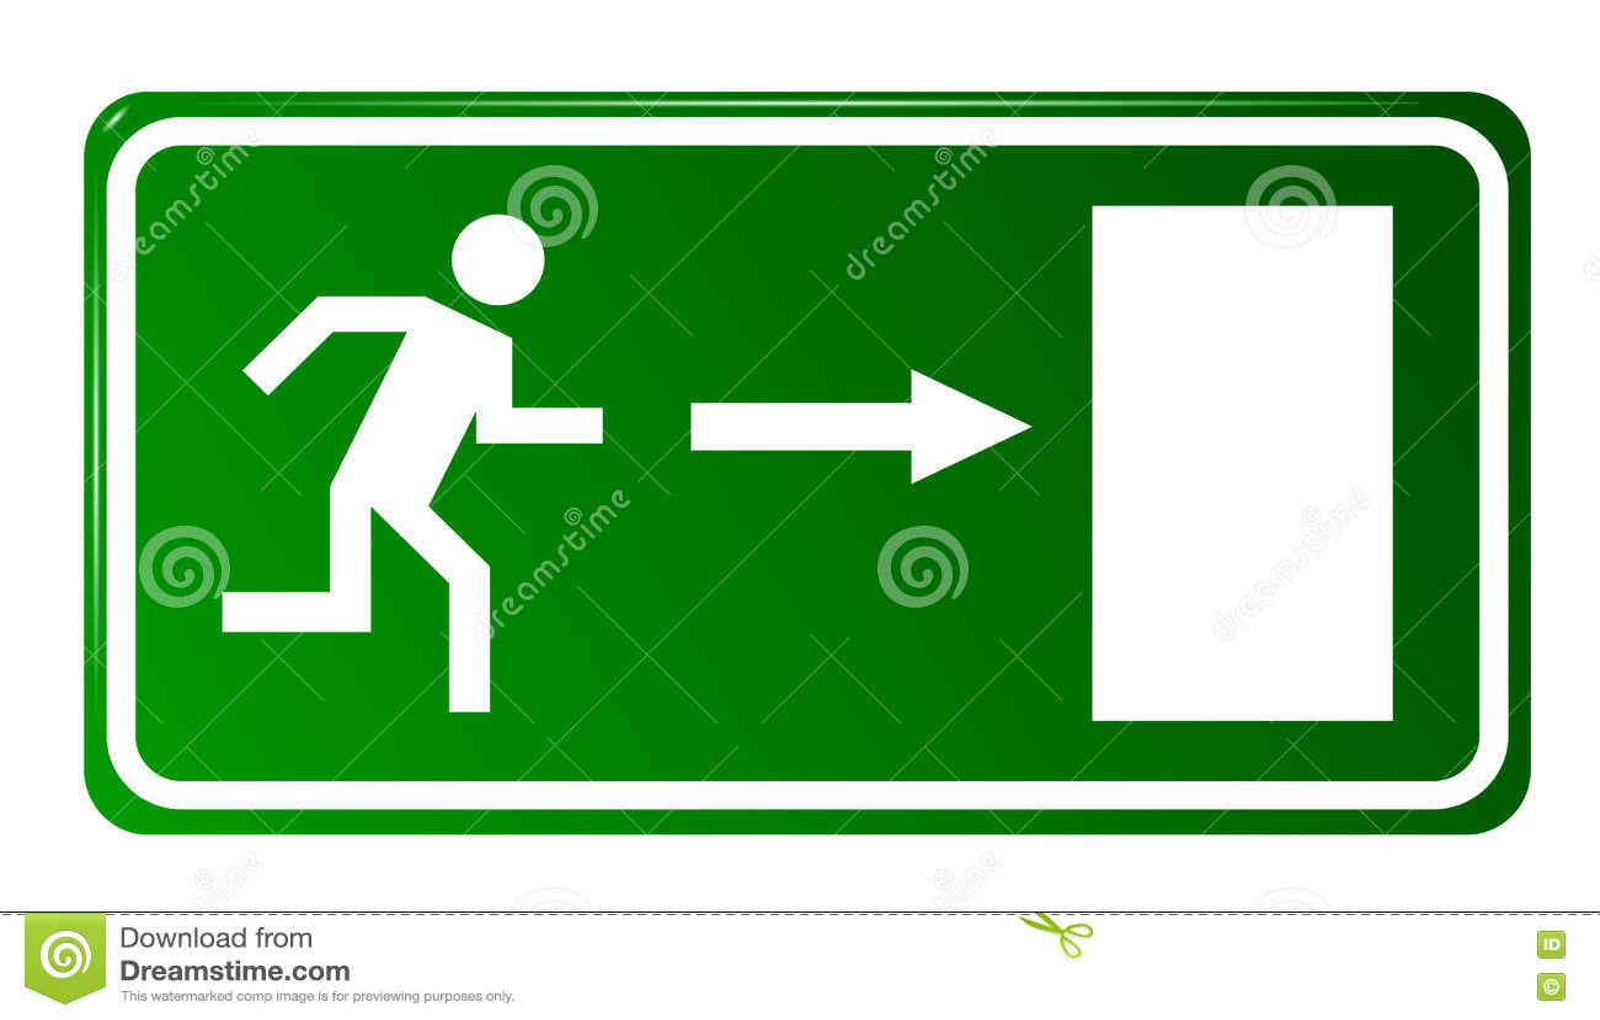 Puerta de salida de emergencia stock de ilustraci n for Precio de puertas salida de emergencia